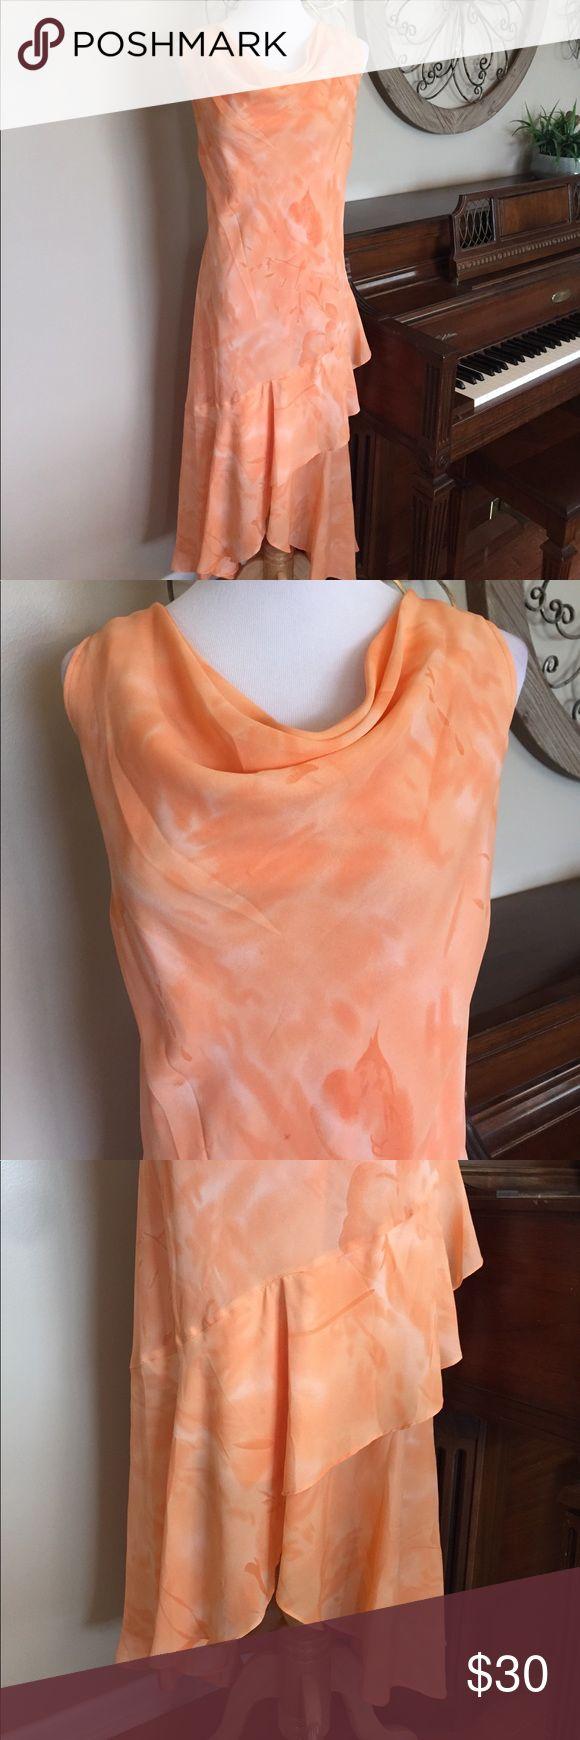 NWT Ashley Stewart Size 18 Orange Drape Neck Dress New! Adorable Dress From Ashley Stewart in Size 18 - Drape Neck & High/Low Bottom Ashley Stewart Dresses High Low